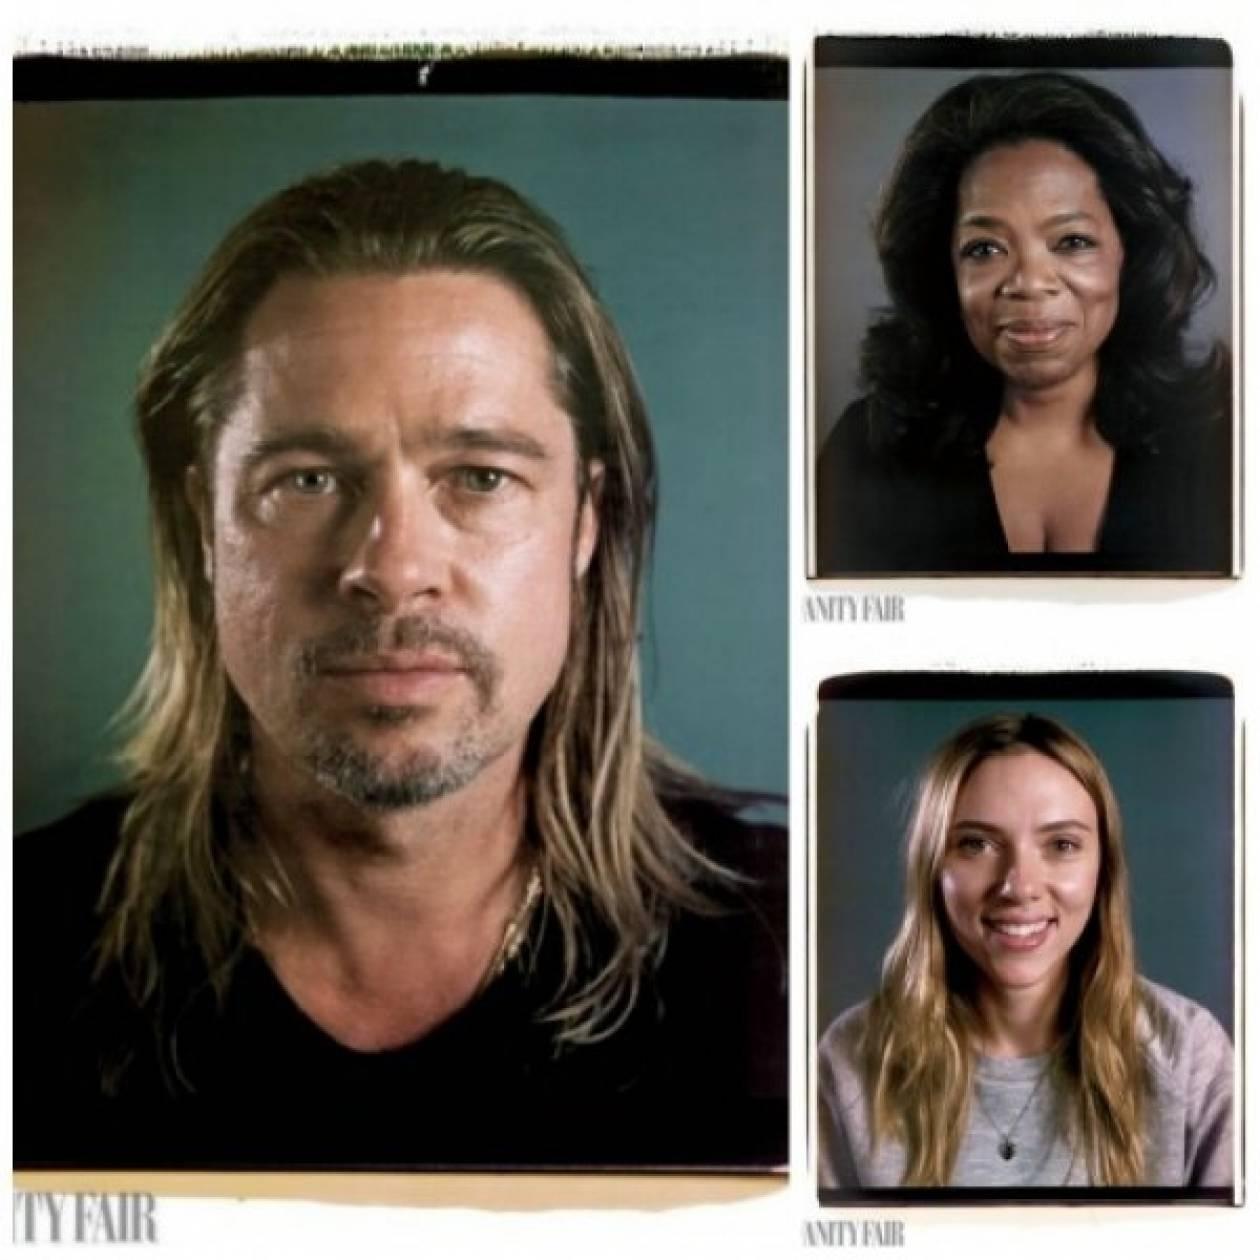 O Chuck Close φωτογραφίζει 20 σταρ του Hollywood